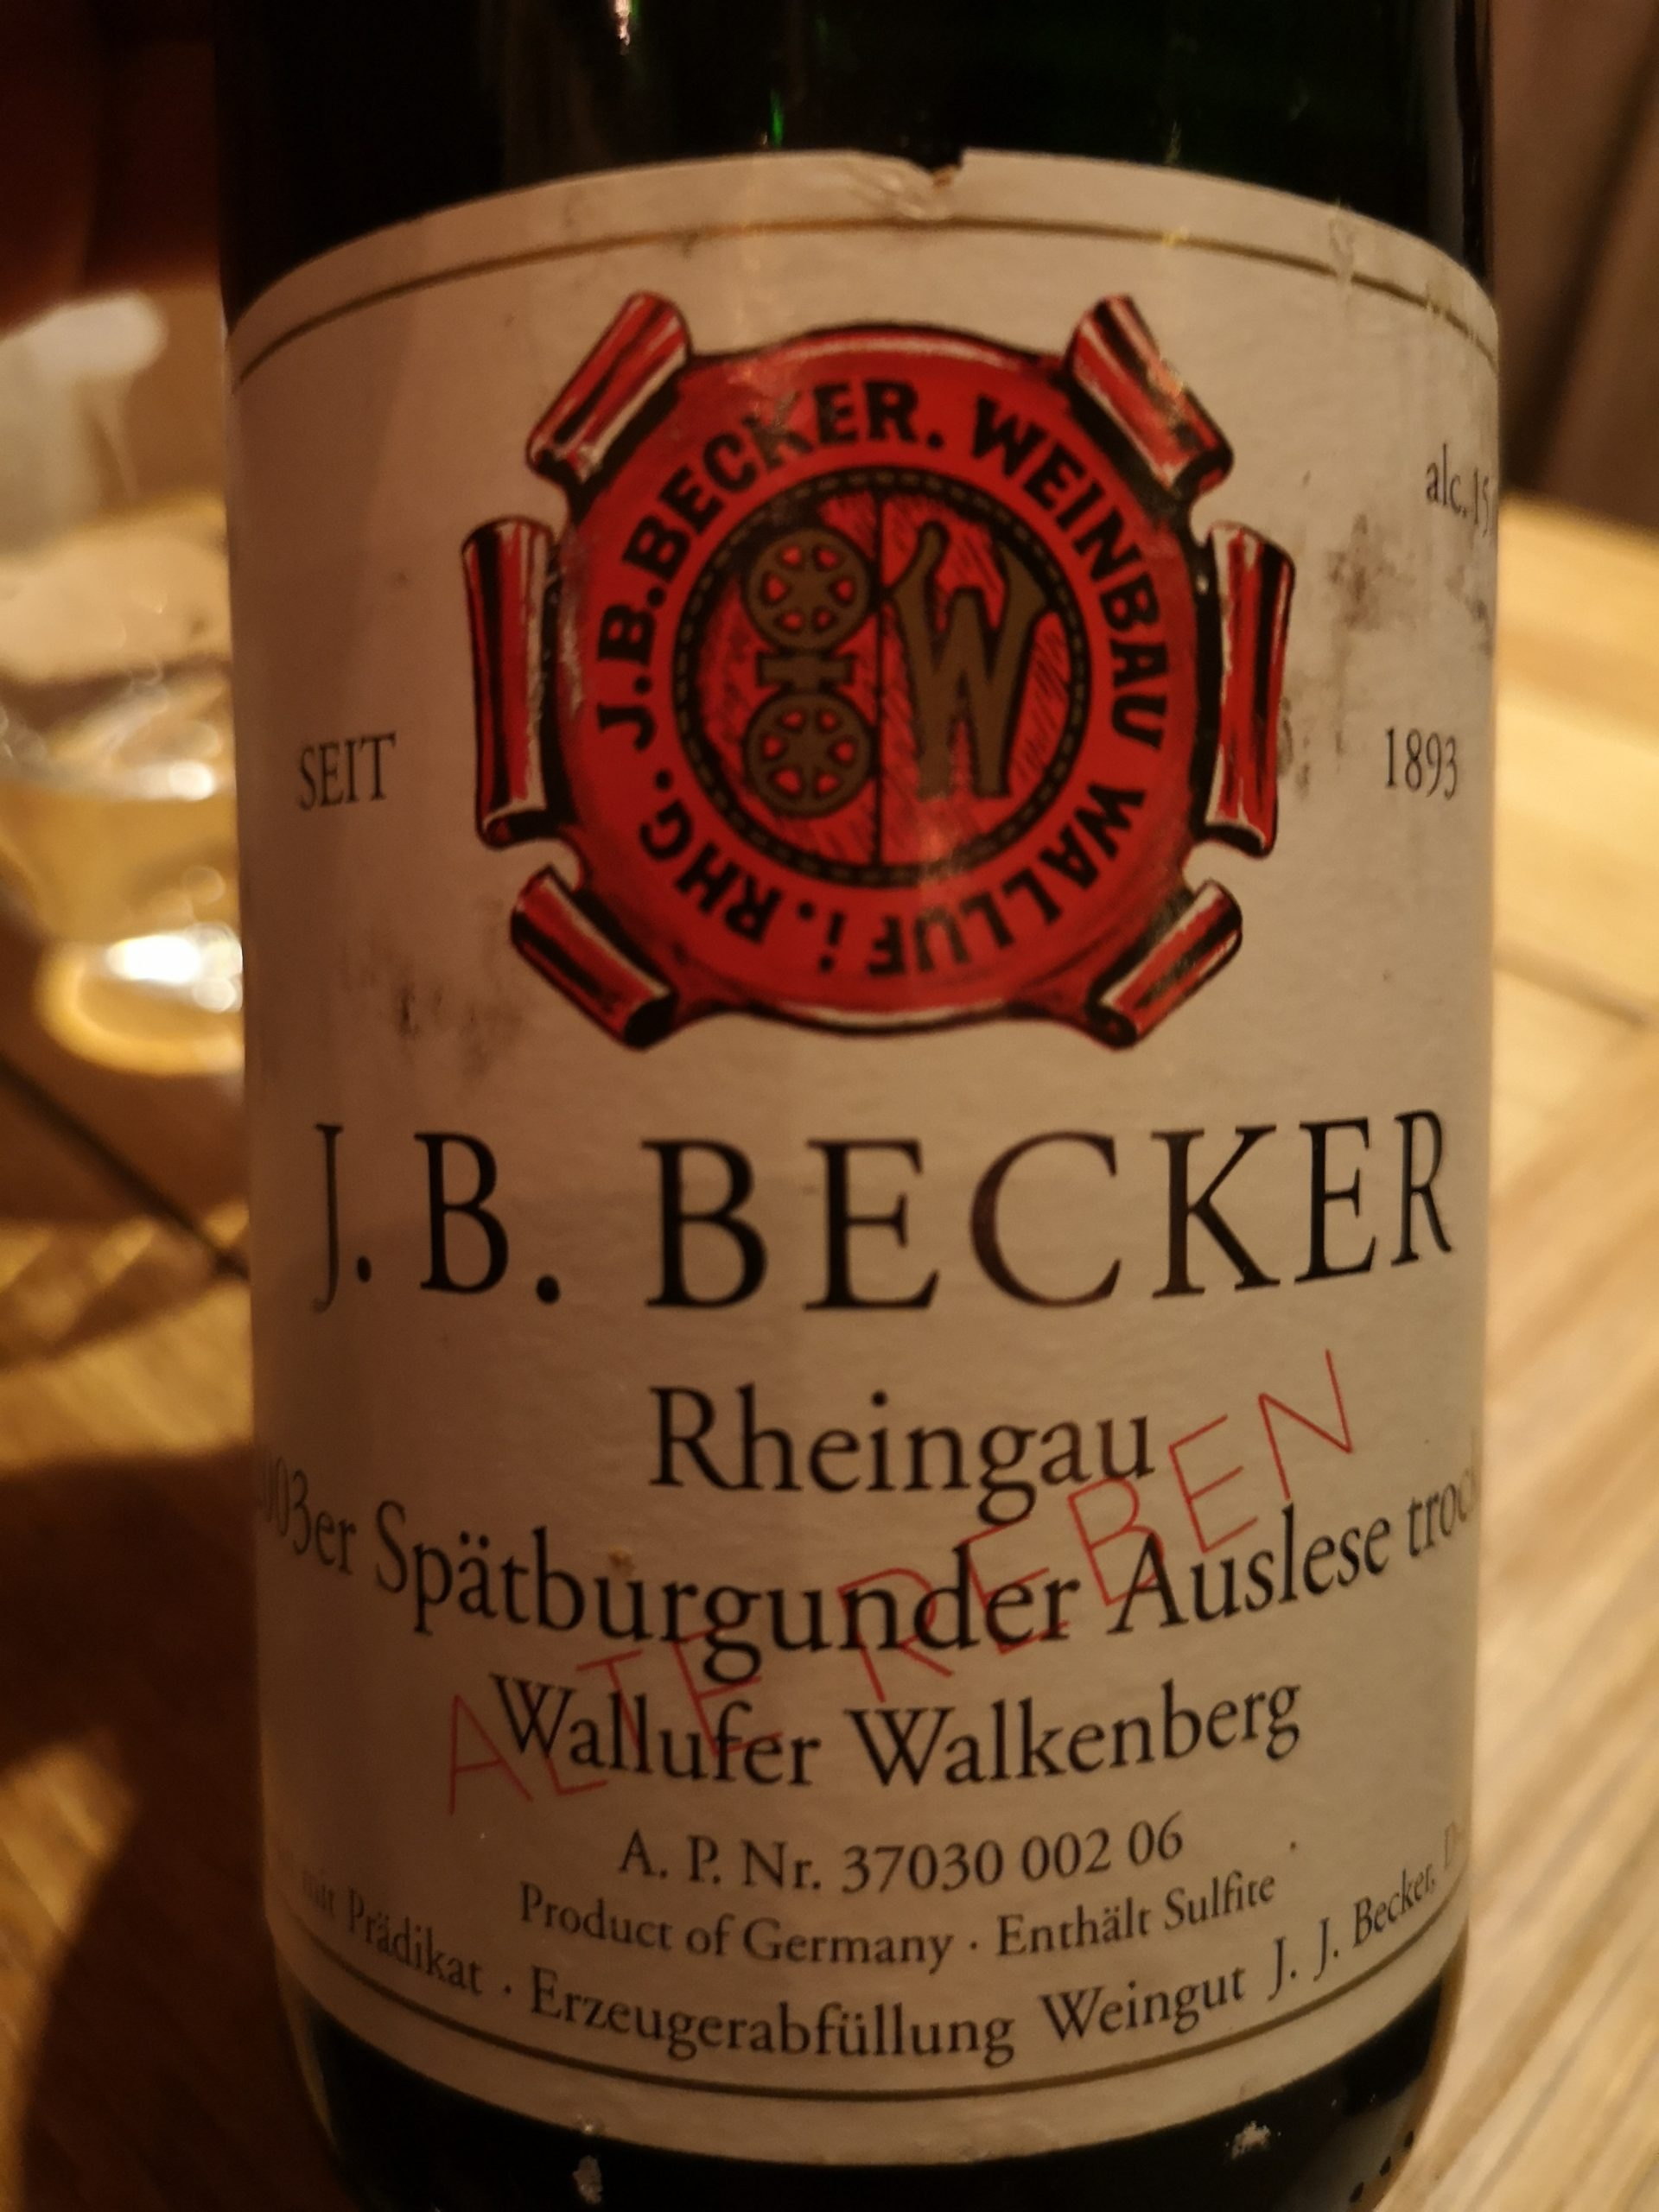 2003 Spätburgunder Wallufer Walkenberg   J.B. Becker